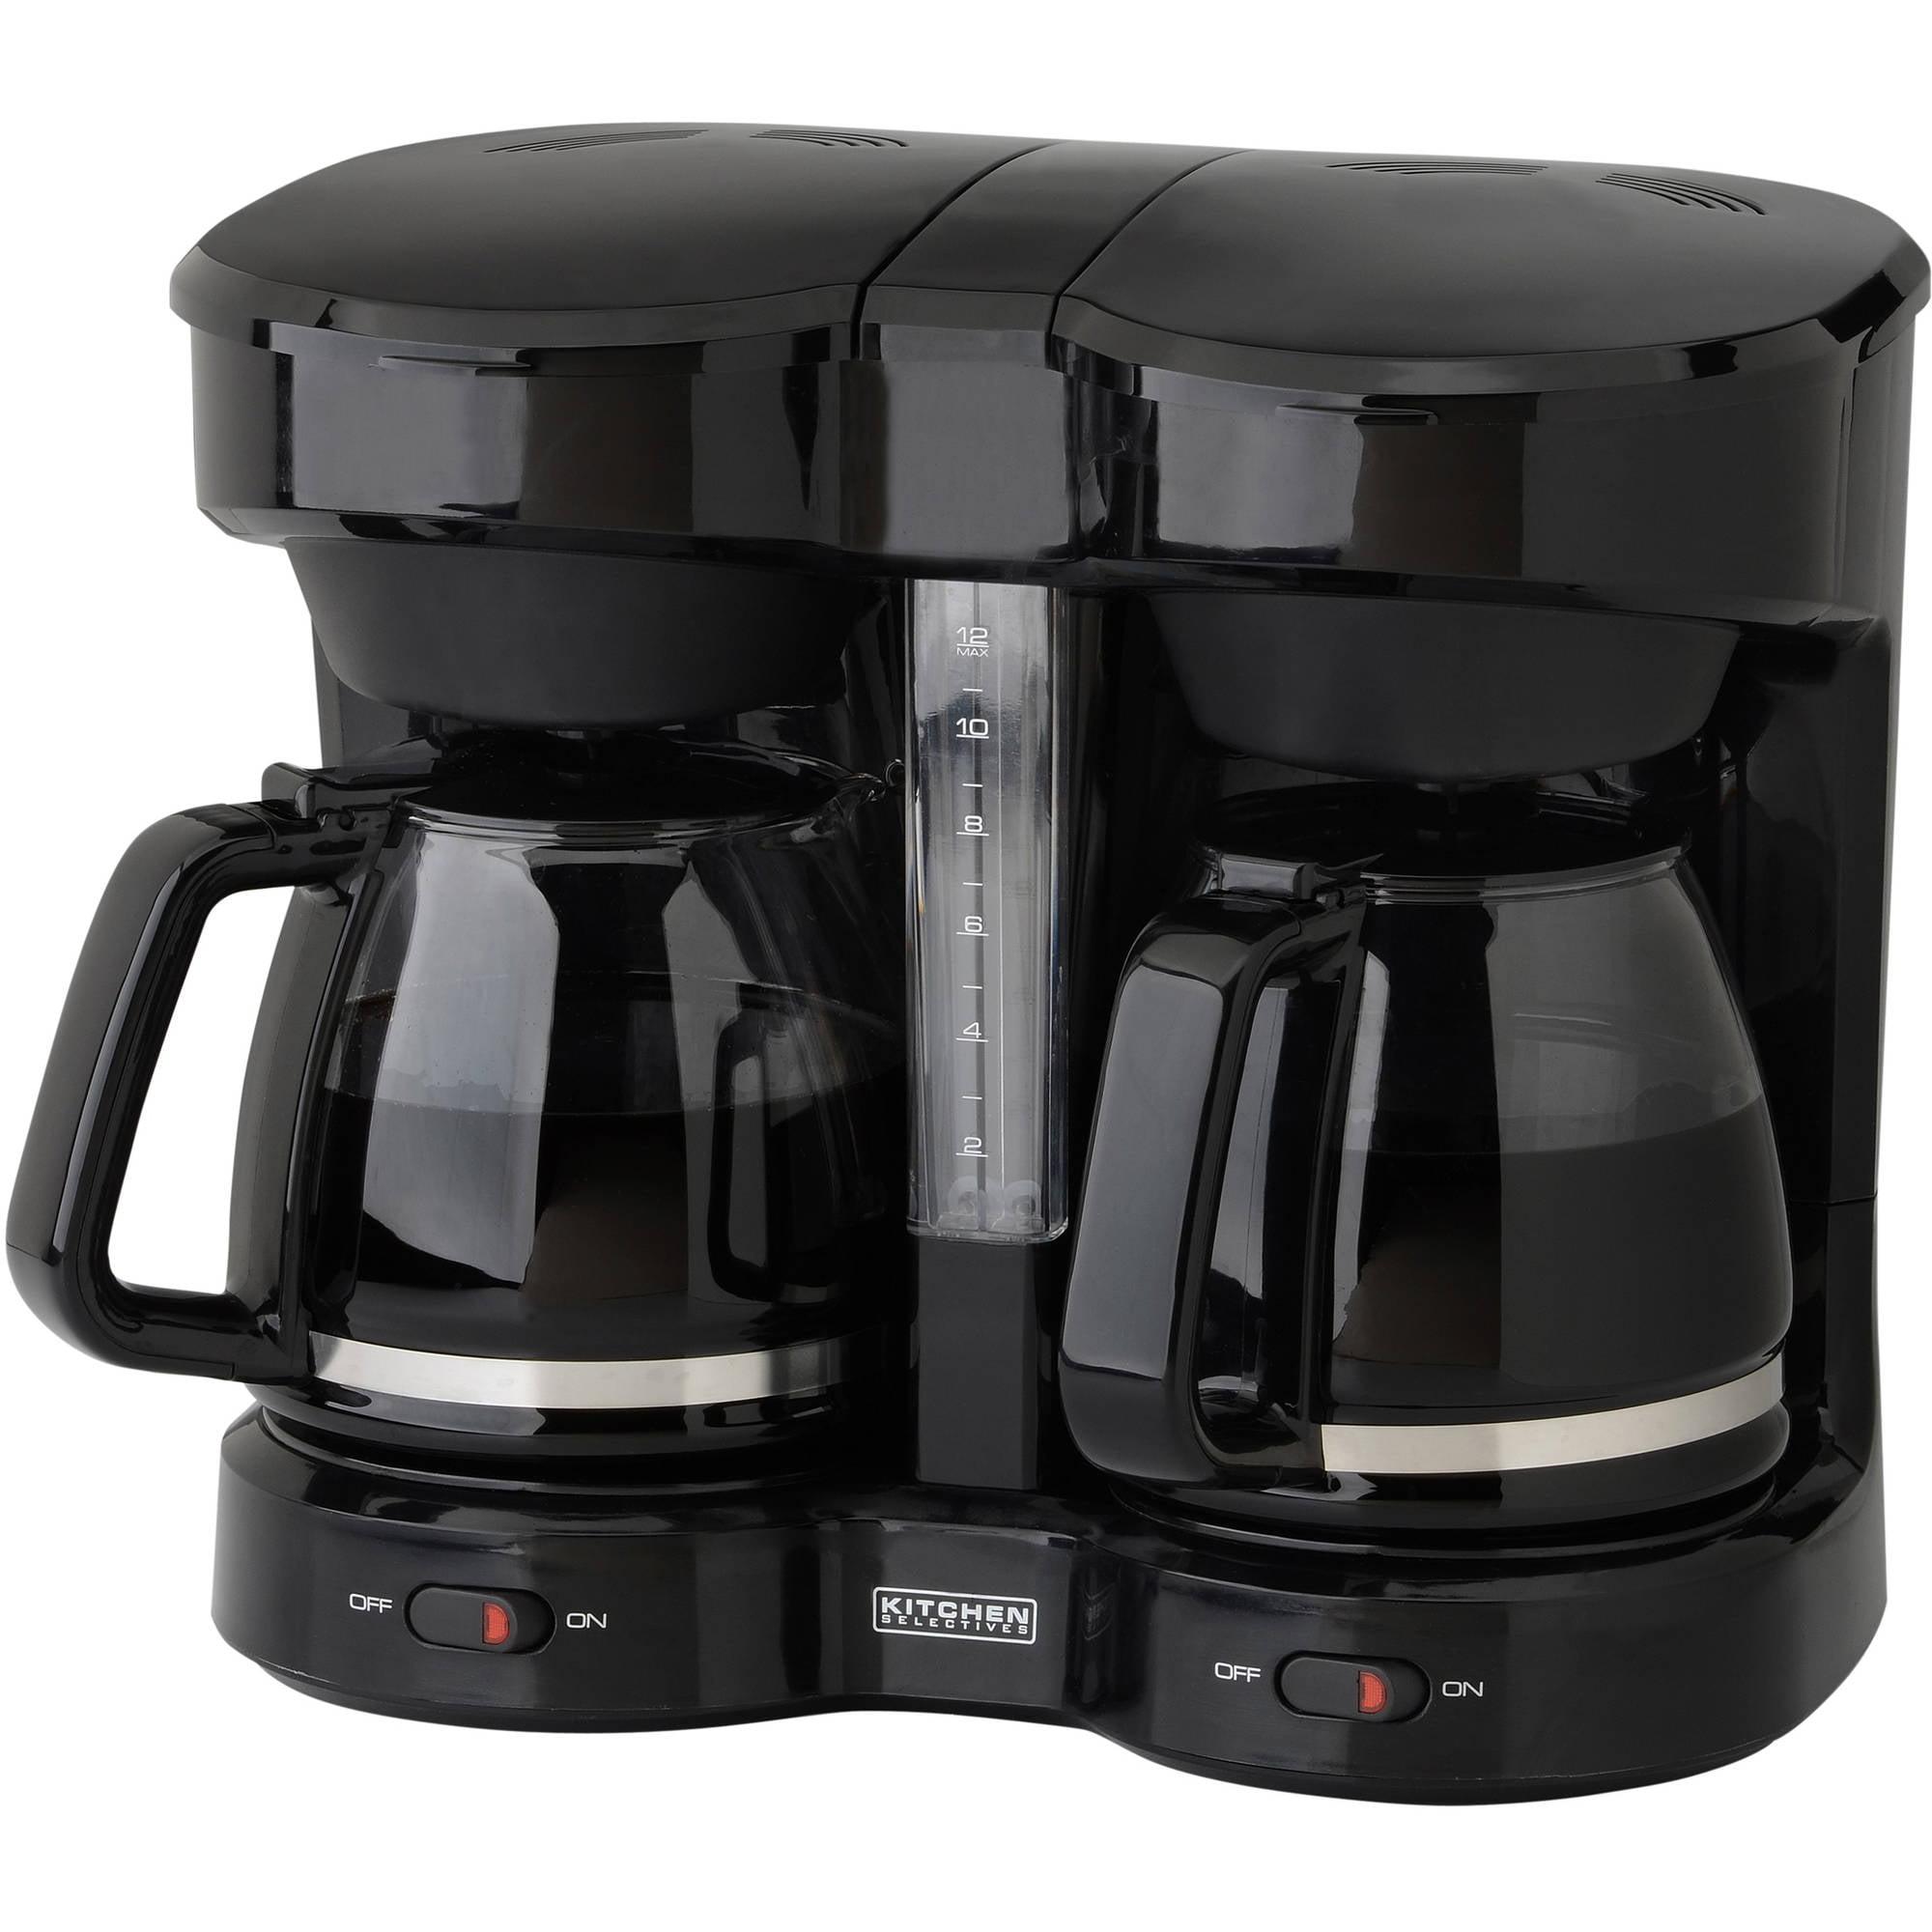 Kitchen Selectives Dual Coffee Maker, Black